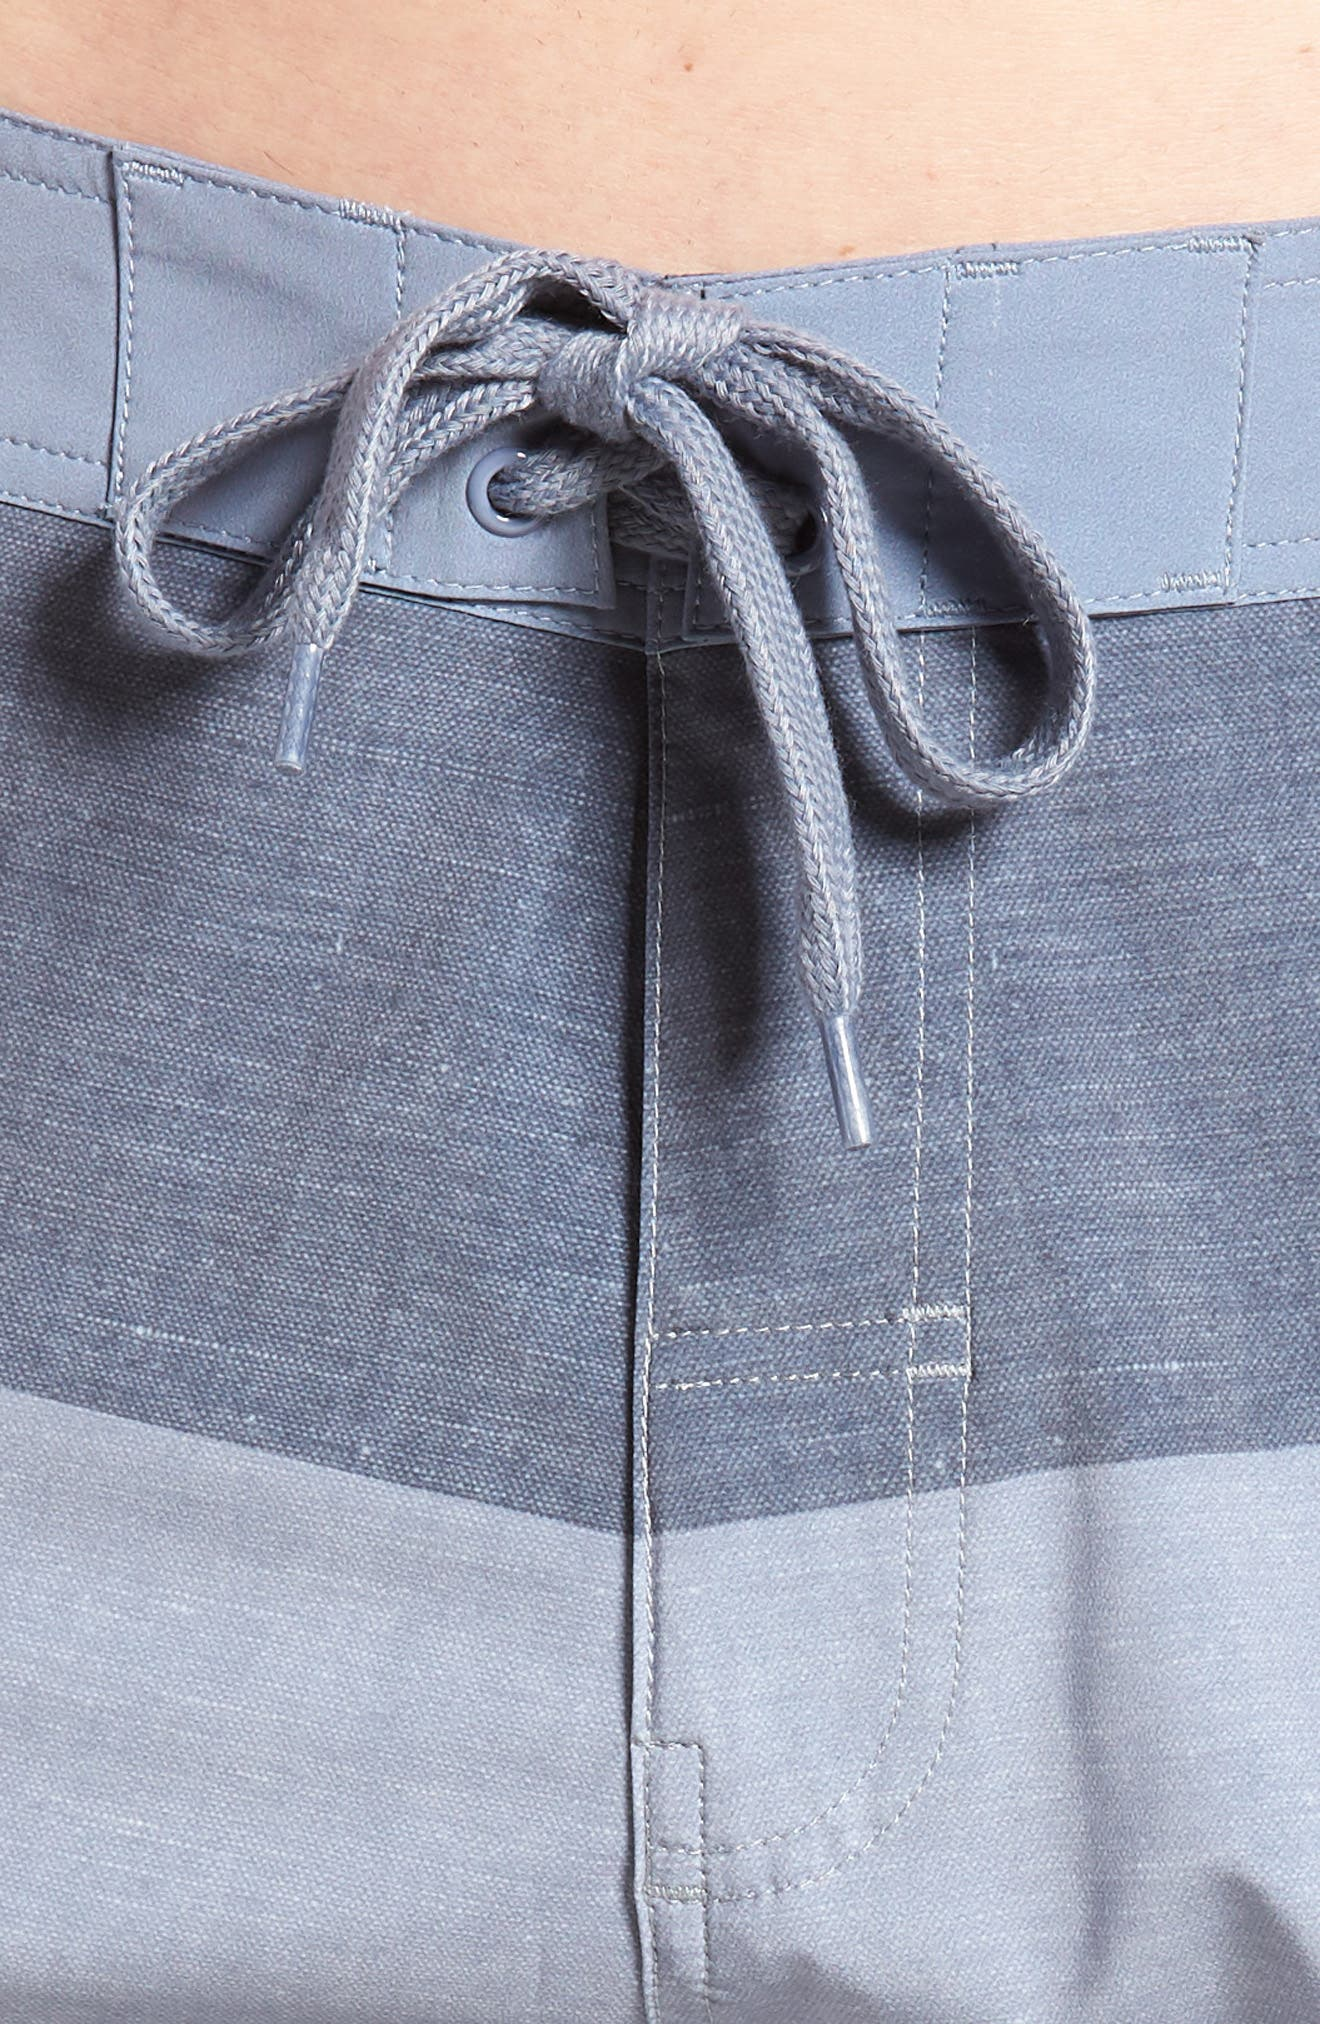 Seegrid Regular Fit Board Shorts,                             Alternate thumbnail 4, color,                             401